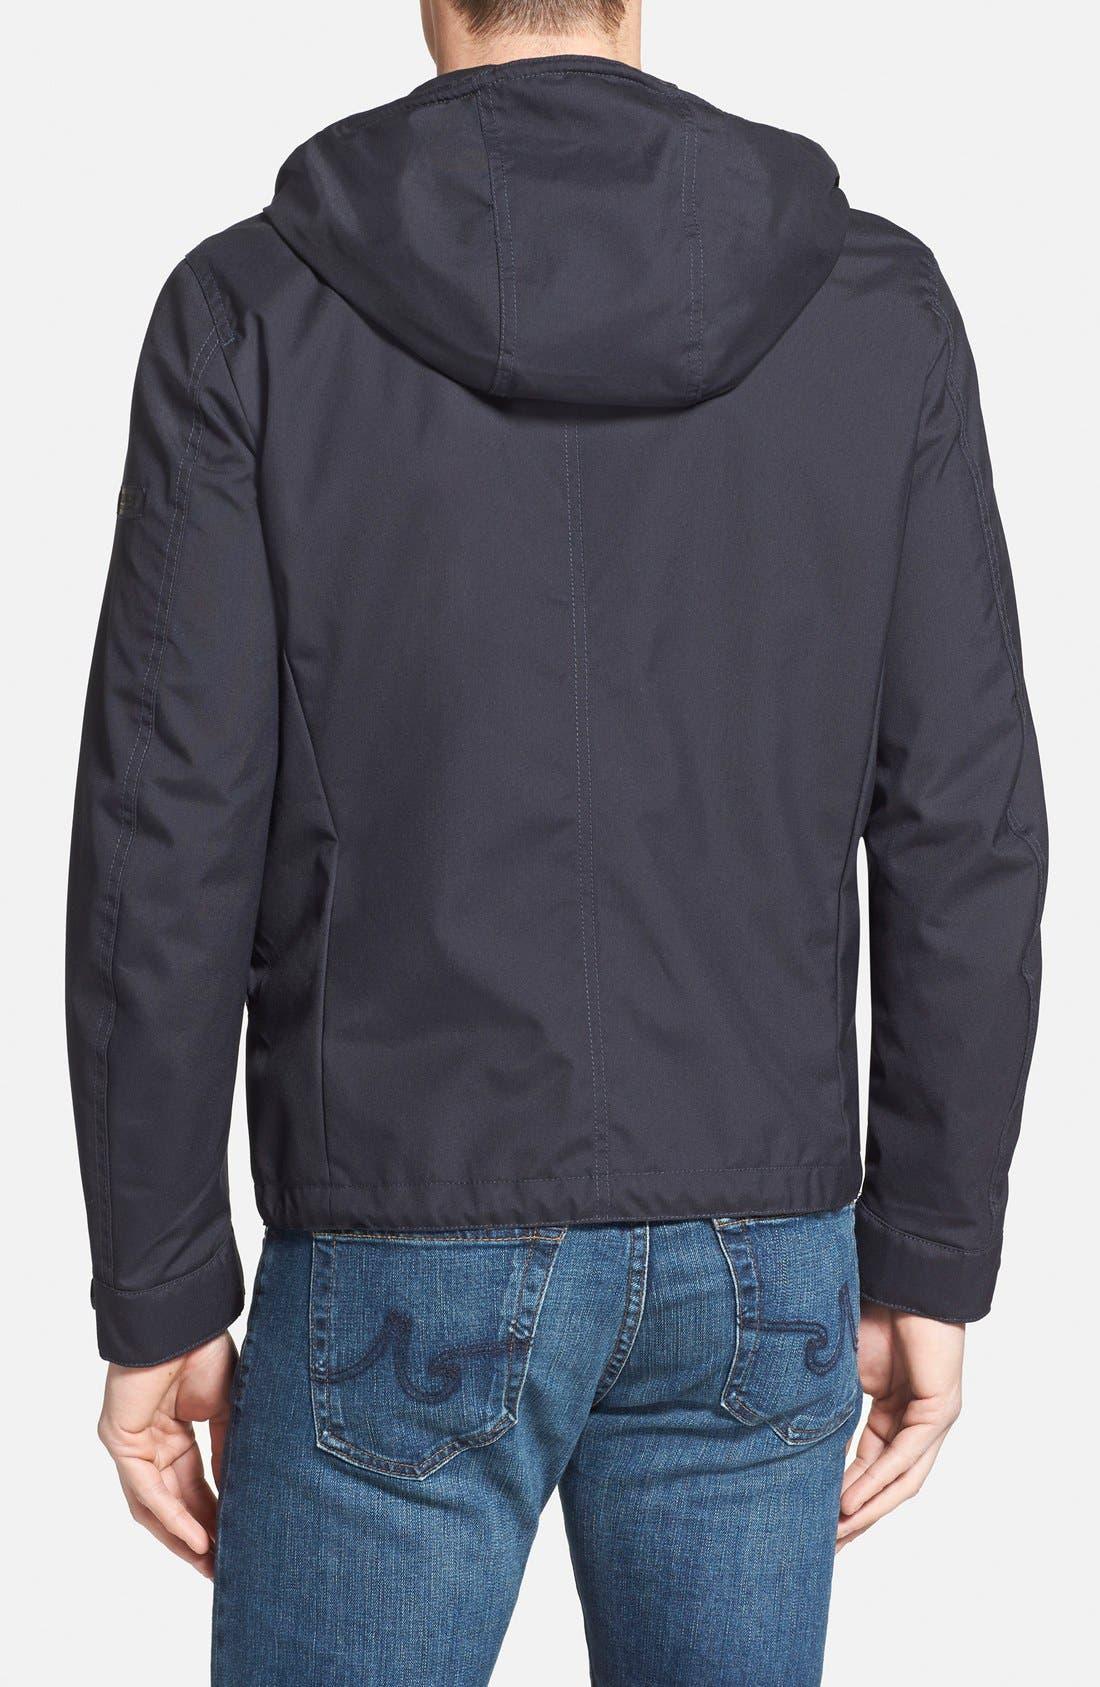 Woolrich 'Teton Rudder' Hooded Canvas Jacket,                             Alternate thumbnail 4, color,                             410